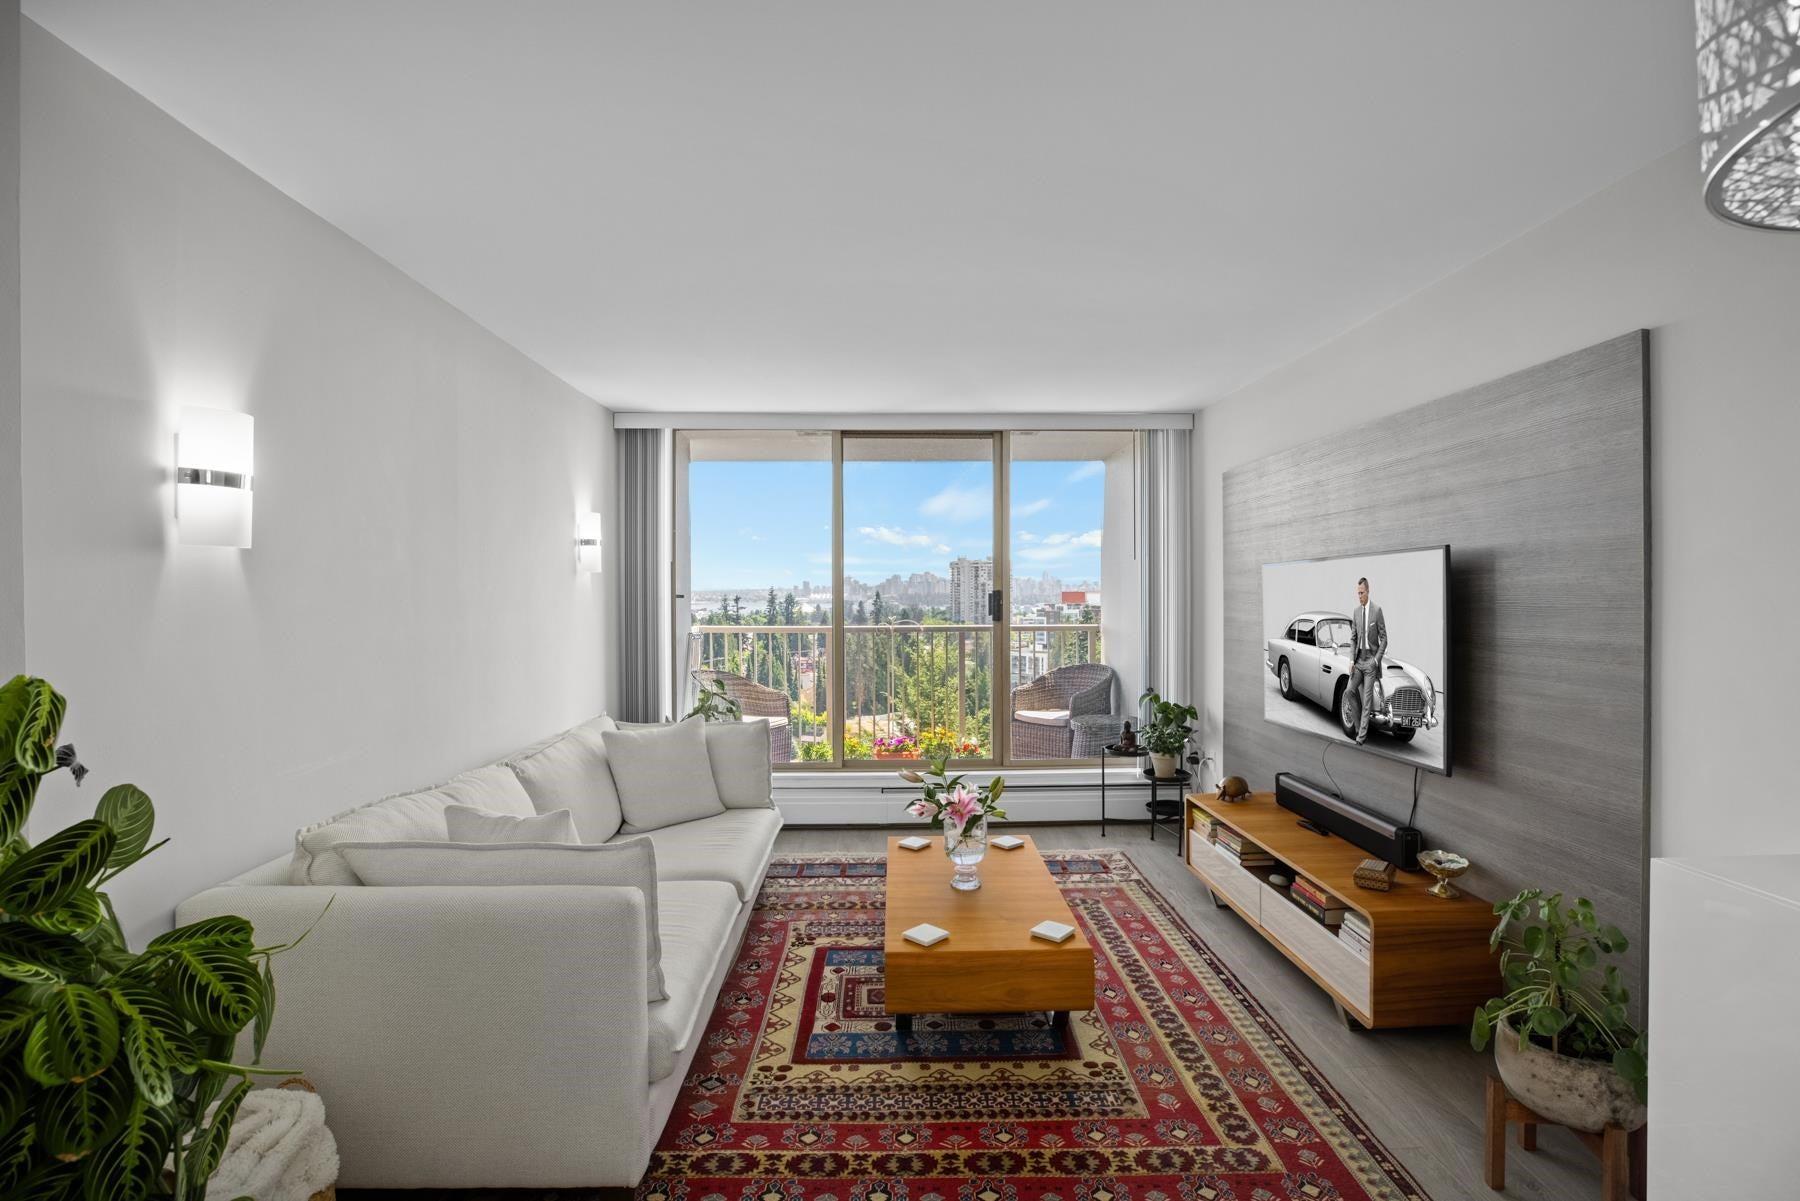 1210 2004 FULLERTON AVENUE - Pemberton NV Apartment/Condo for sale, 1 Bedroom (R2597645) - #1